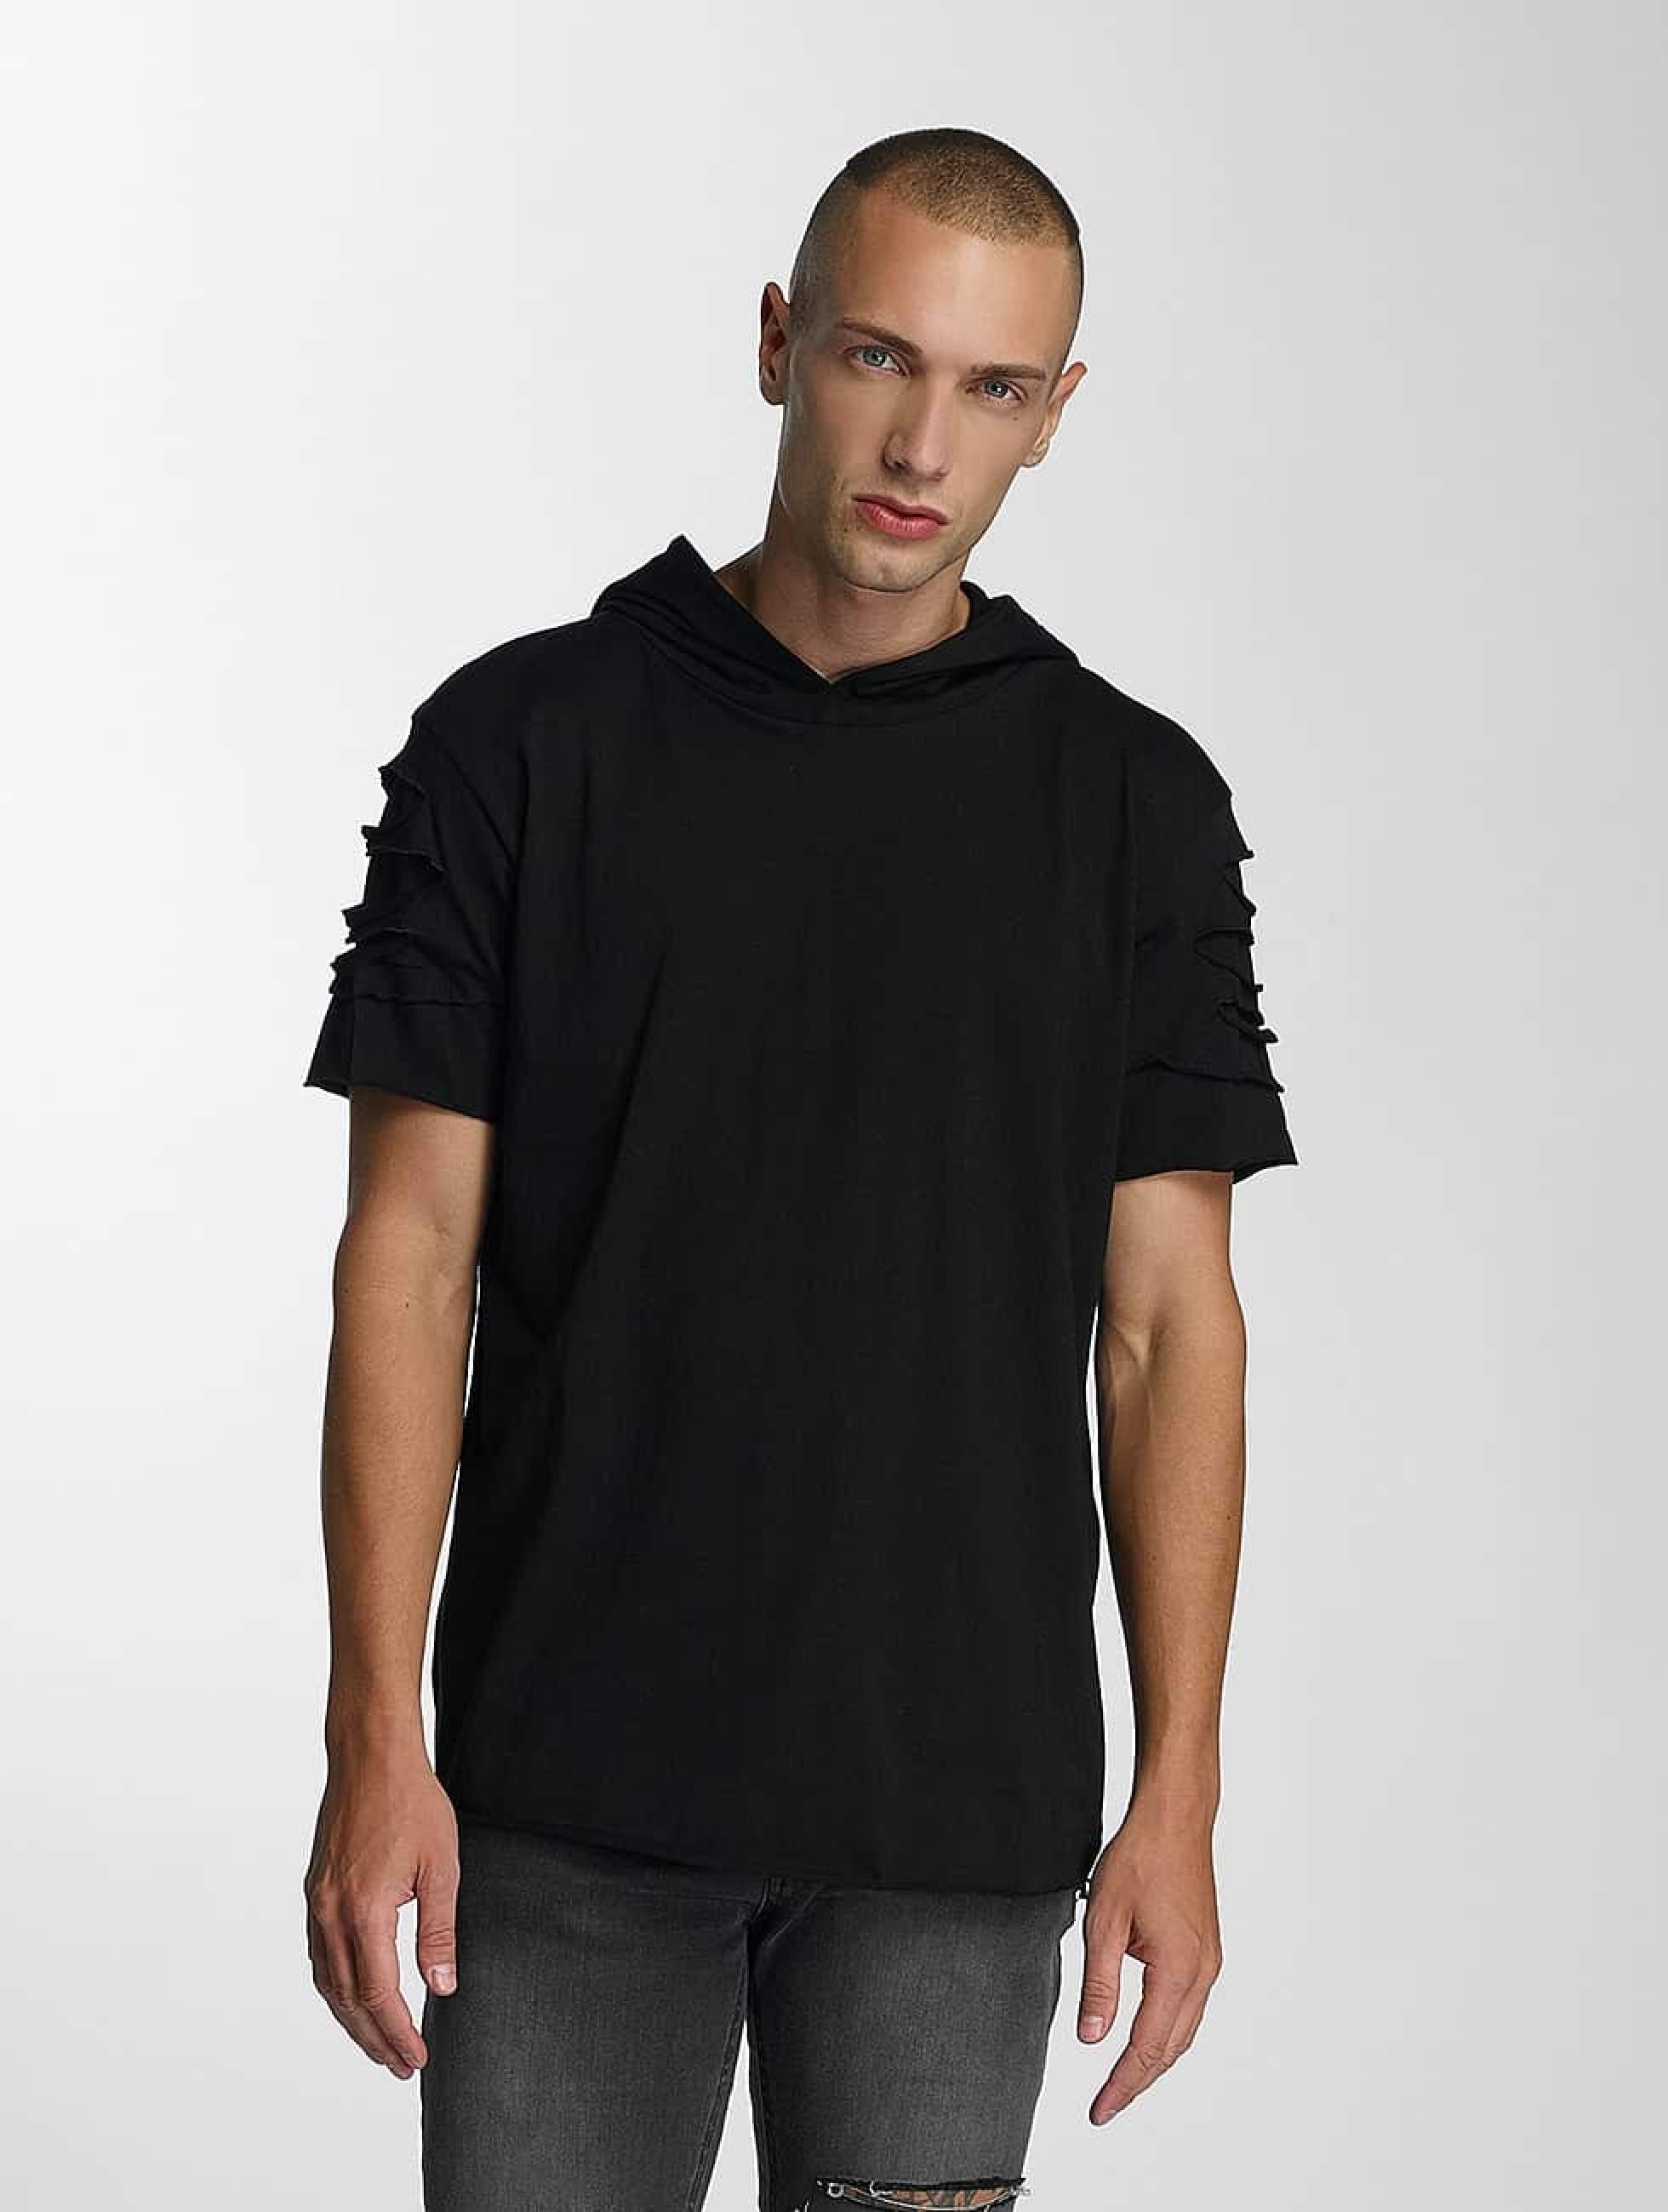 Bangastic / T-Shirt Cuts  in black S